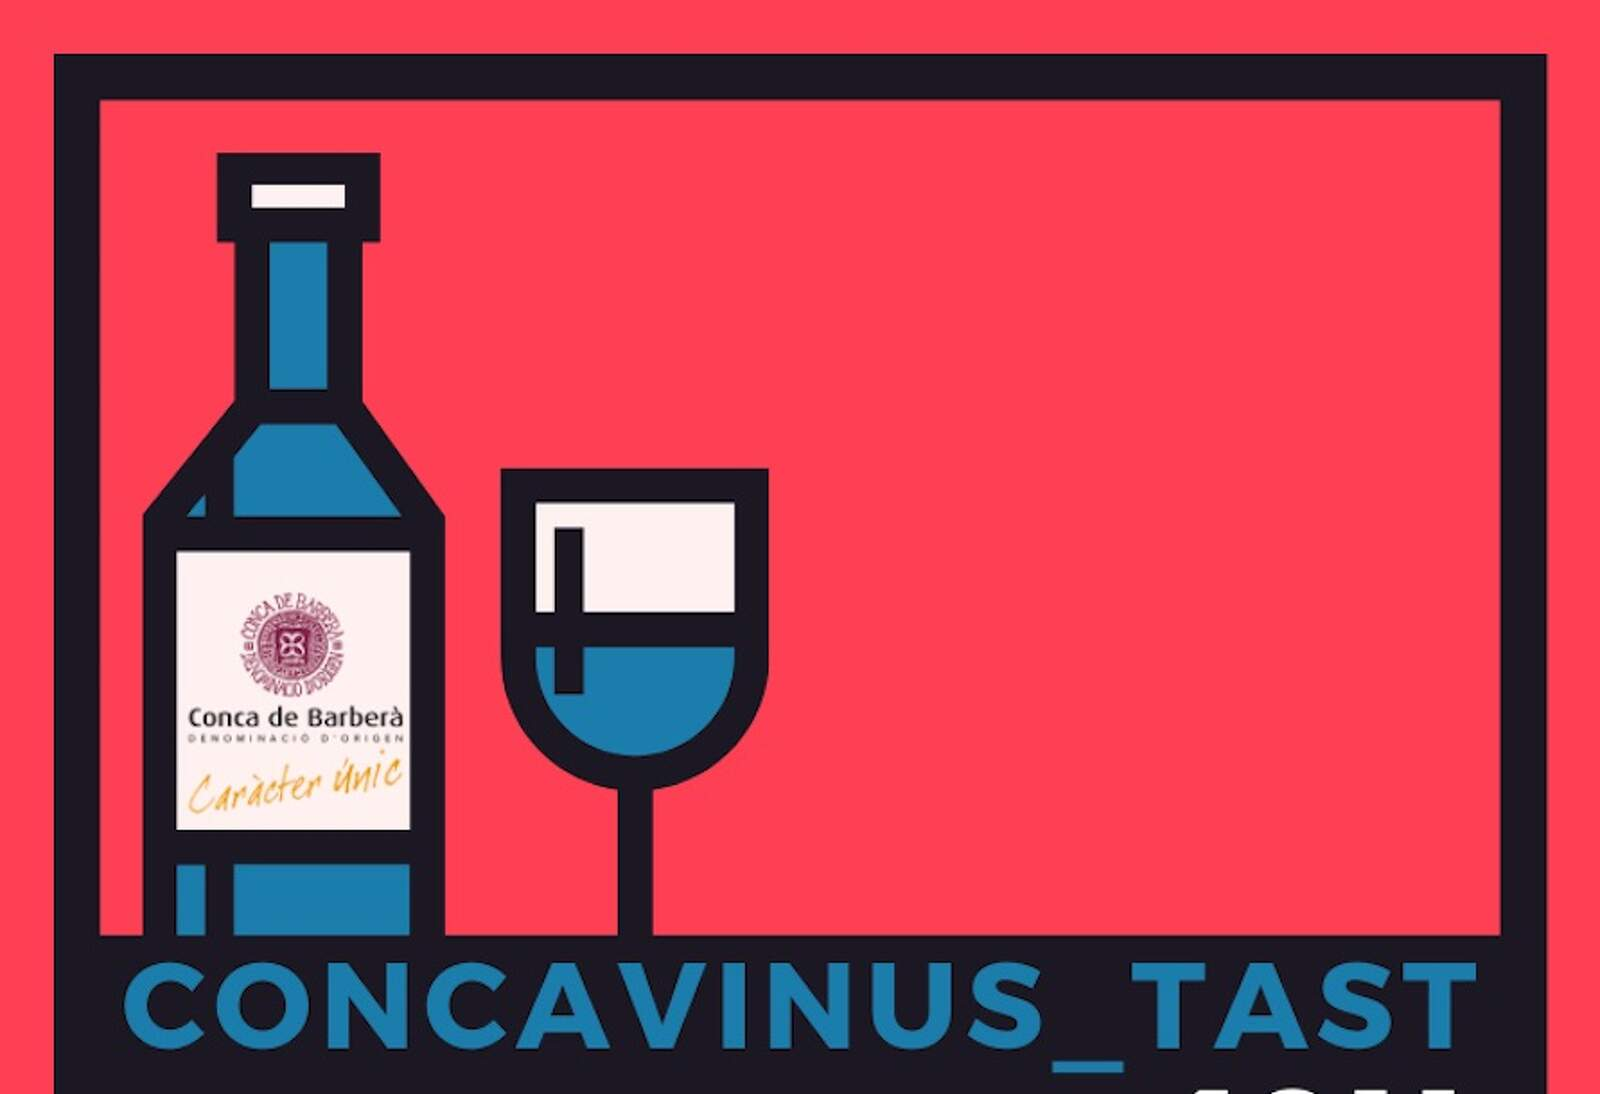 Tastos online de la DO Conca de Baberà en temps de coronavirus